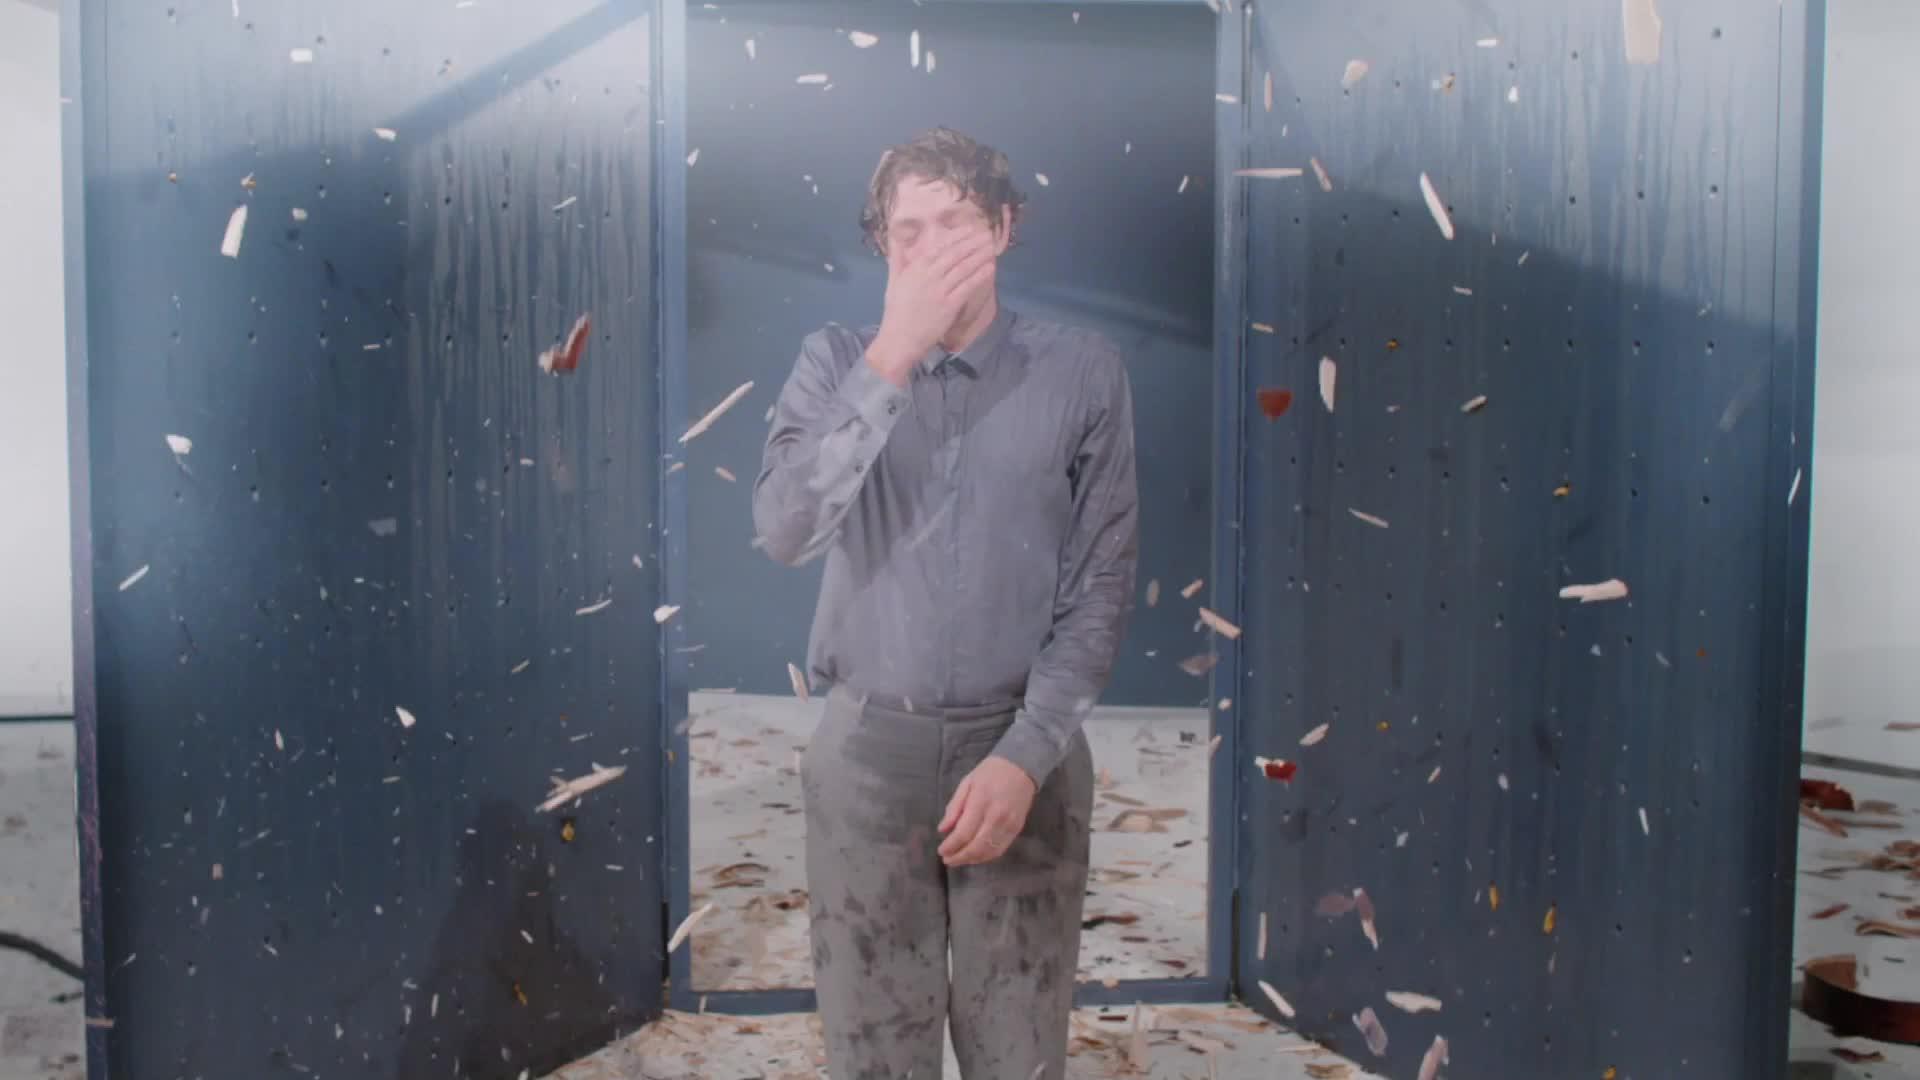 Damian Kulash, OK Go, The One Moment, moment, morton, music, okgo, one, theonemoment, Slick it back Damian - OK Go GIFs